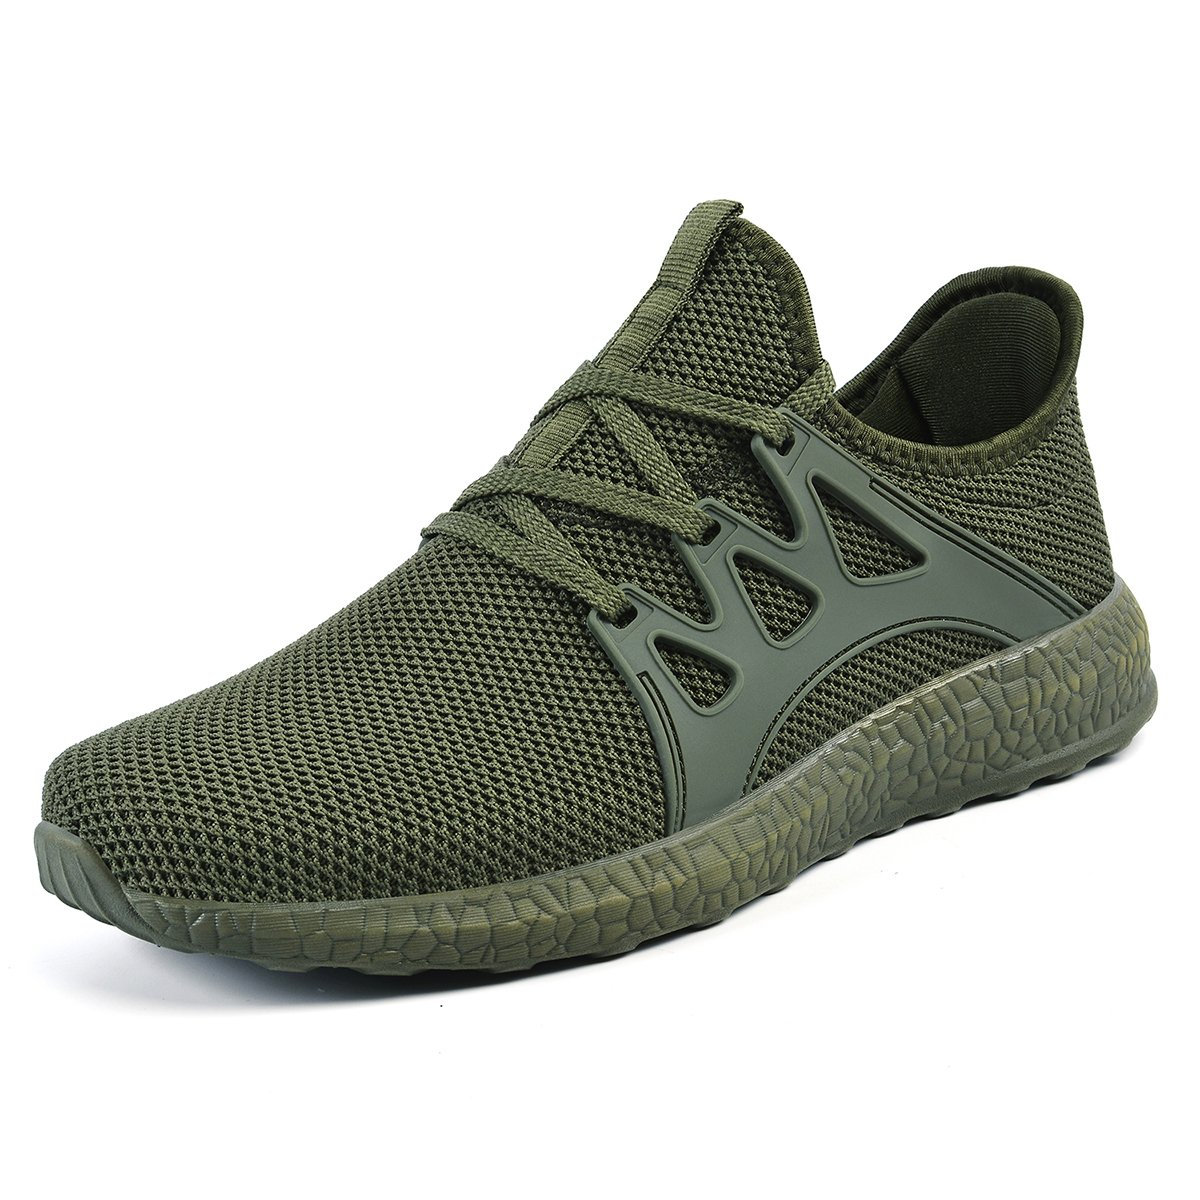 baff3bac58c80 ZOCAVIA Women Running Shoes Slipon Comfortable Lightweight Tennis Shoes  Green 5.5B(M) US